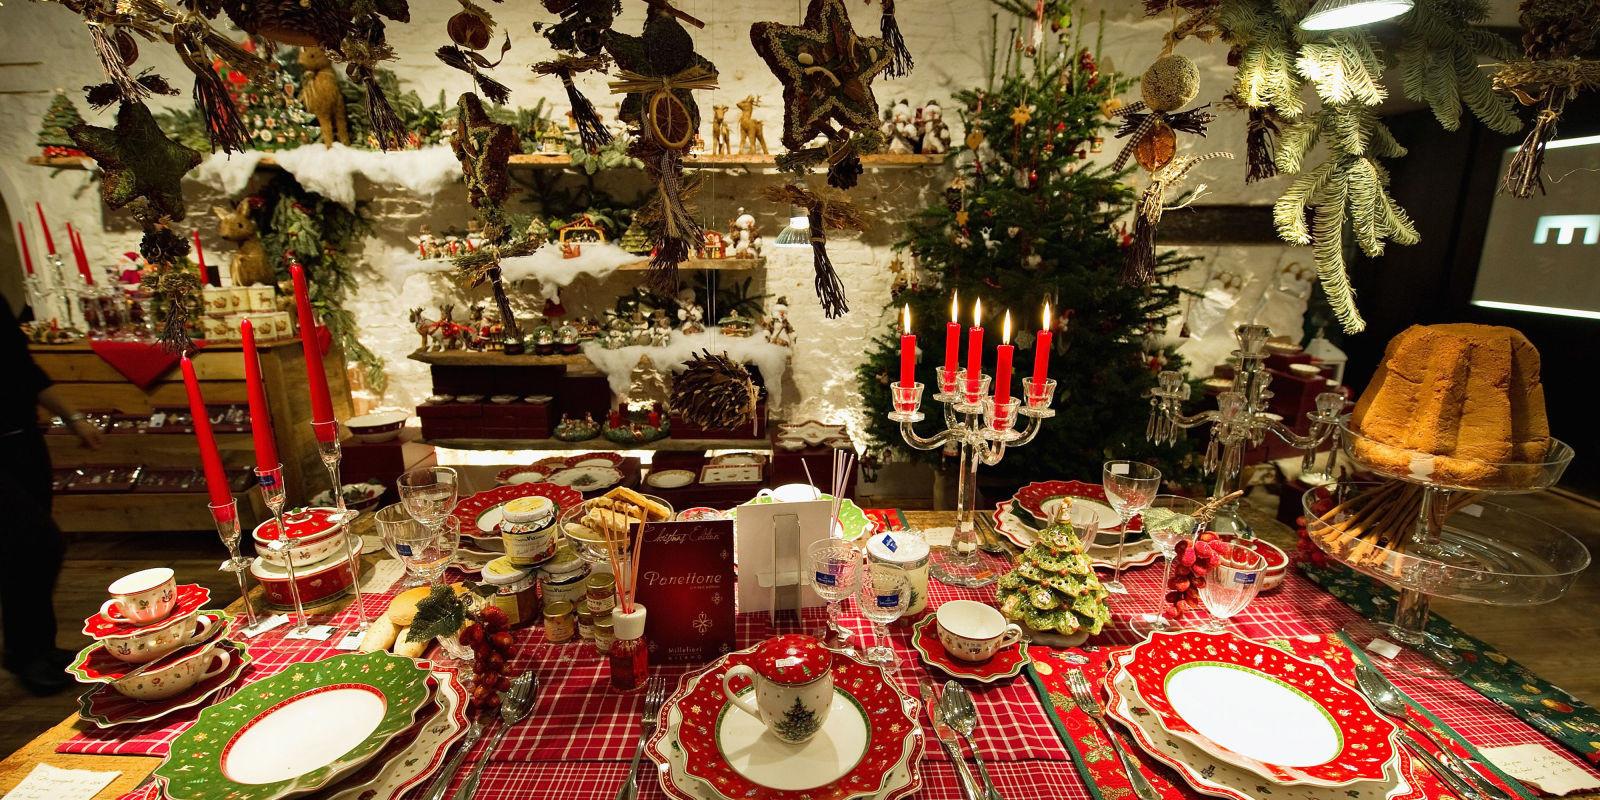 Christmas Theme Dinners  10 Christmas Table Settings 2016 Decoration Ideas for